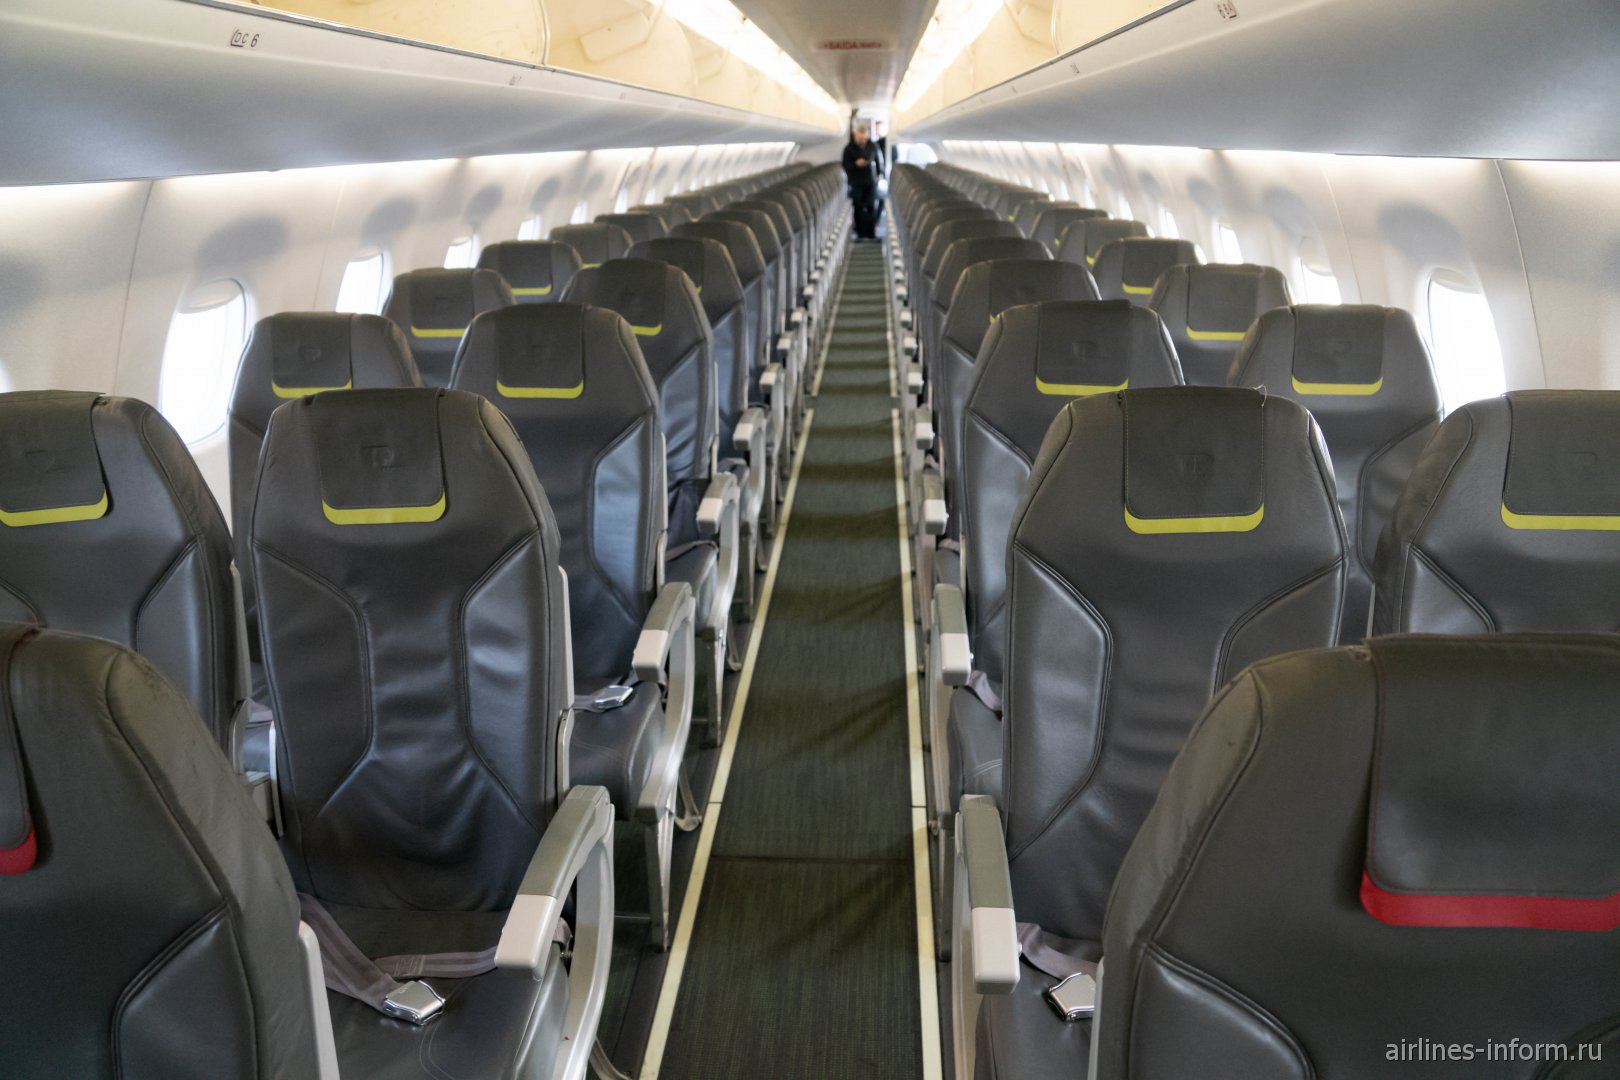 Пассажирский салон самолета Embraer 190 авиакомпании TAP Express